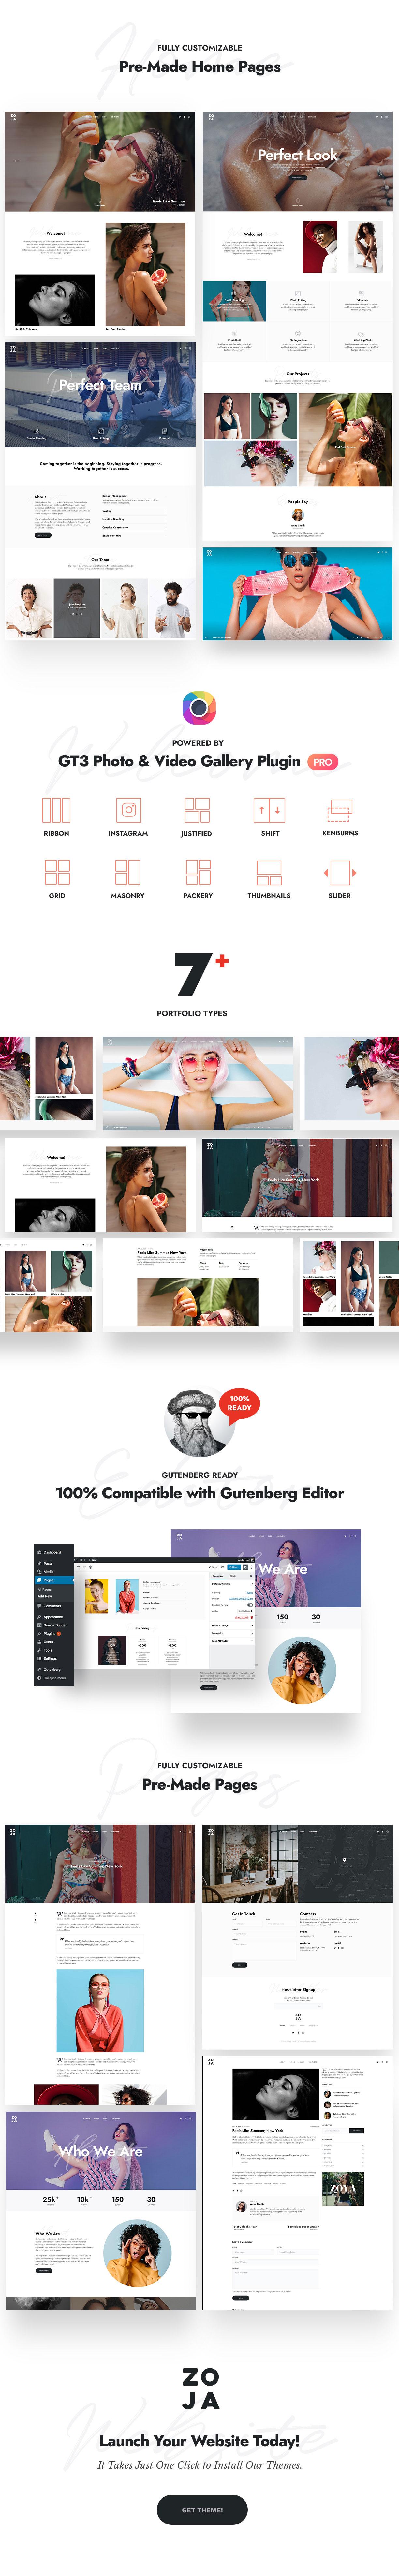 Zoya - Photography WordPress Theme - 1